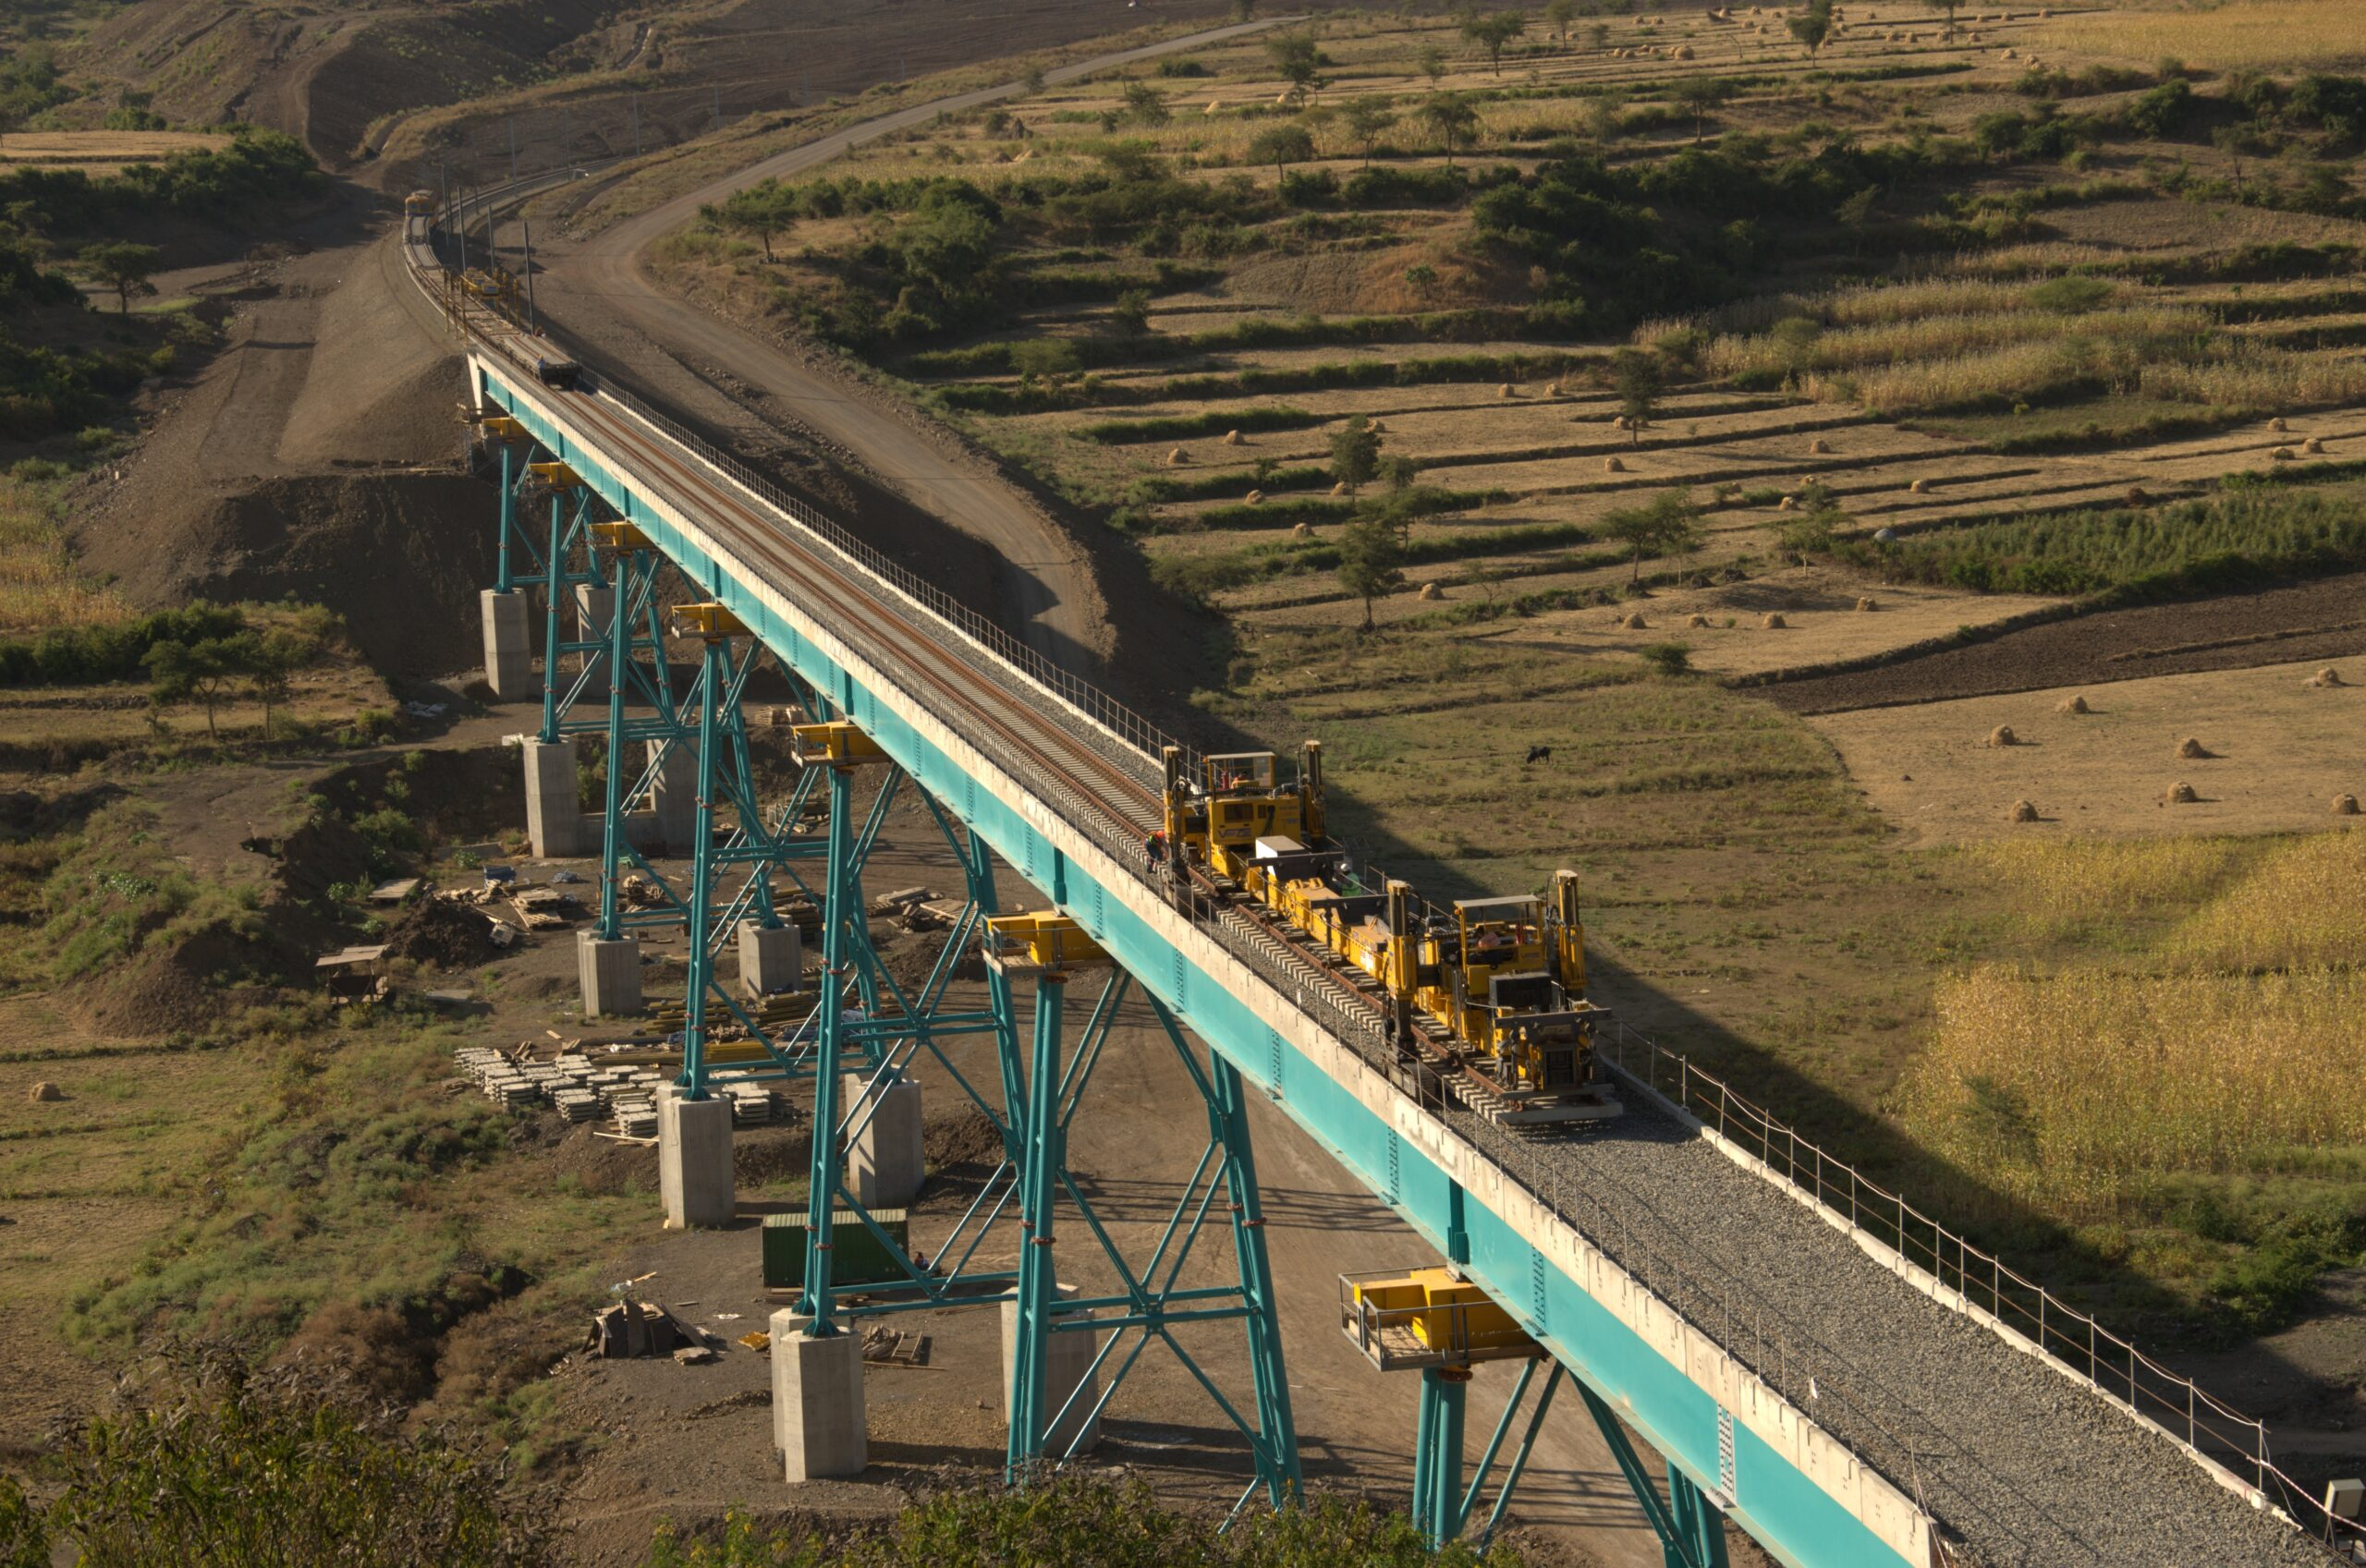 Awash - Kombolcha - Hara Gebaya Railway Line